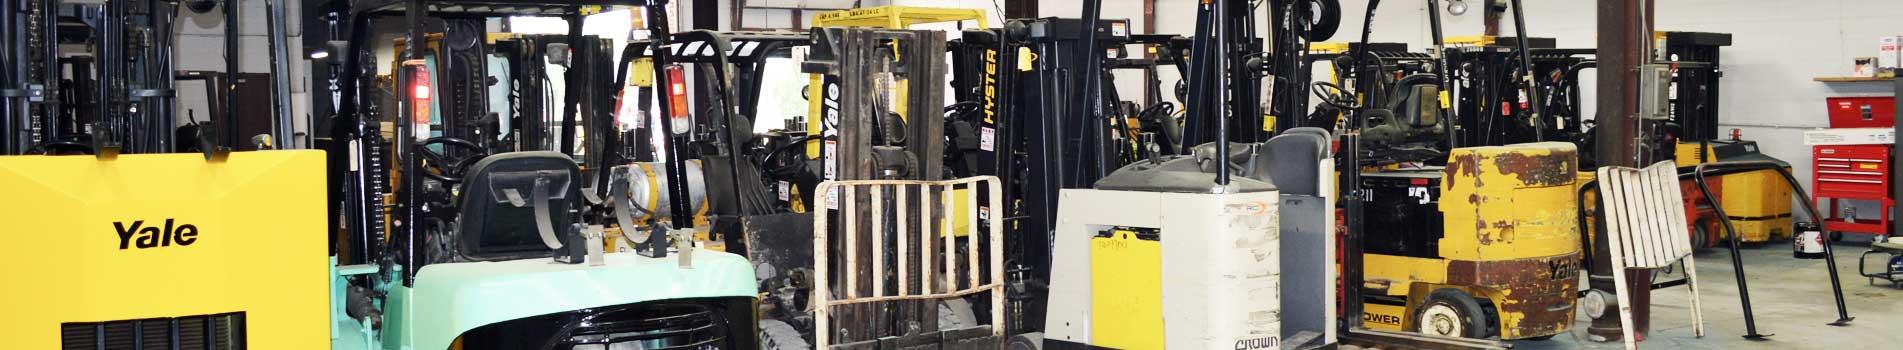 1 Forklift Dealer   Top Quality Forklifts with Same Day Delivery